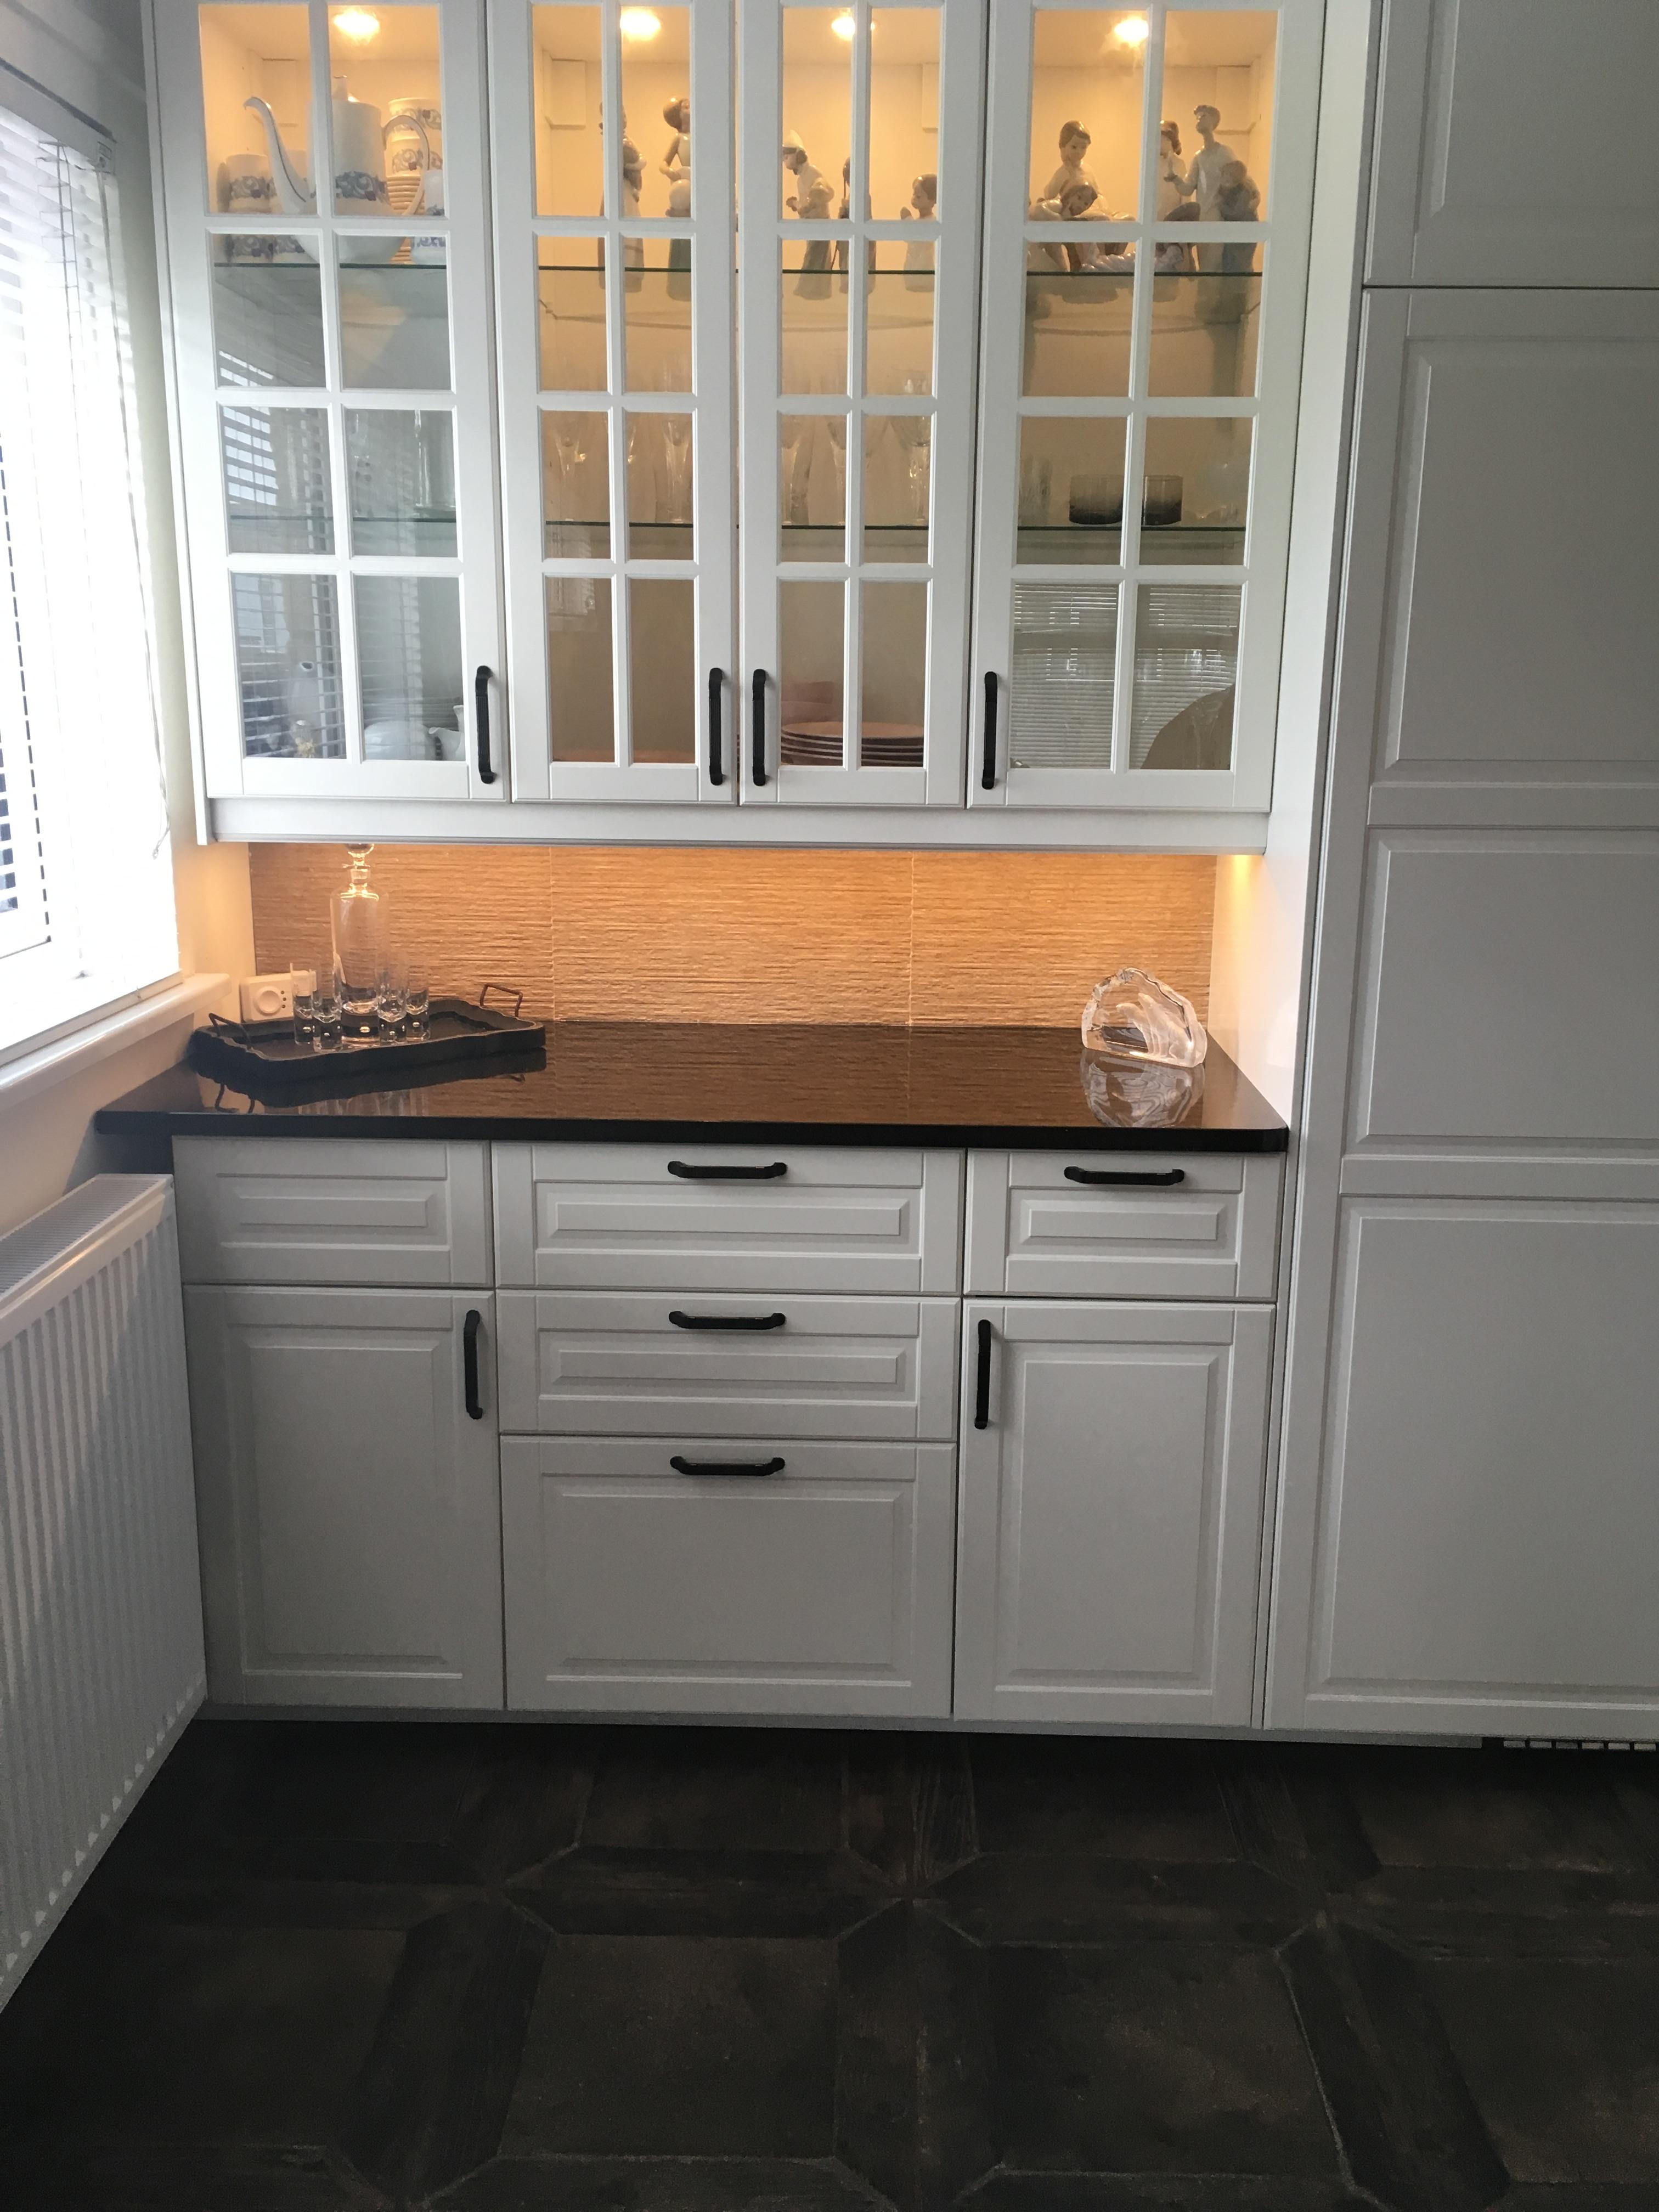 Kitchen star galaxy on gloss white units ayrshire granite img001 img004 img003 img005 img002 dailygadgetfo Image collections